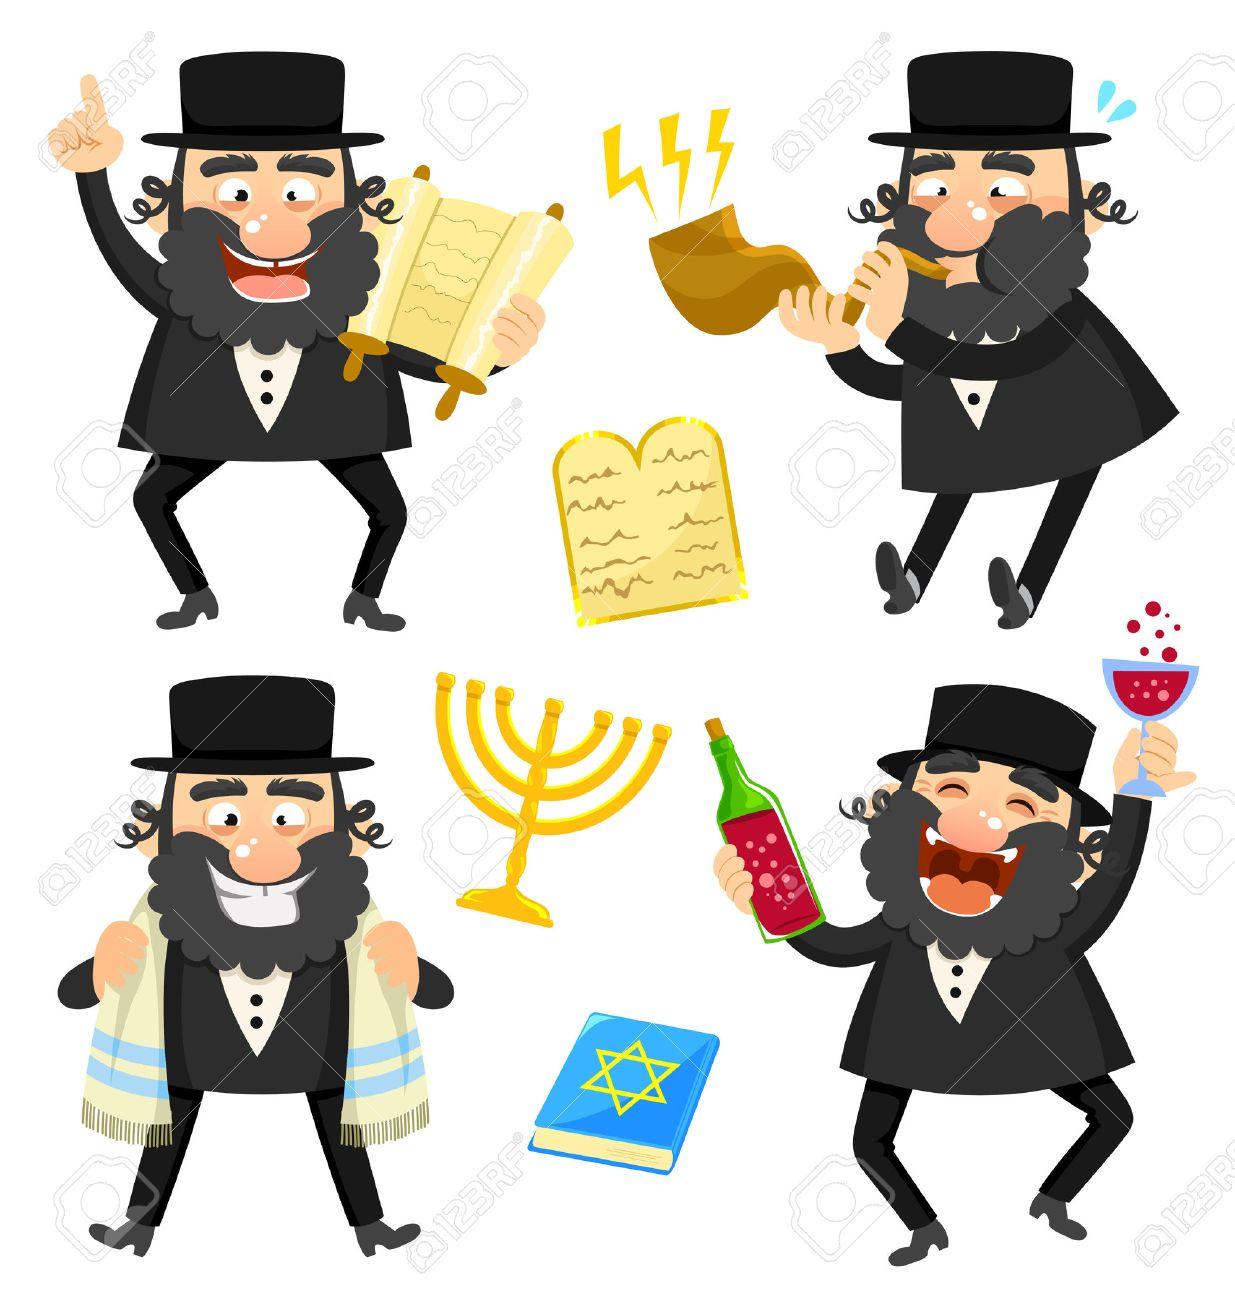 Set of cartoon rabbis and jewish symbols royalty free cliparts set of cartoon rabbis and jewish symbols stock vector 41670960 biocorpaavc